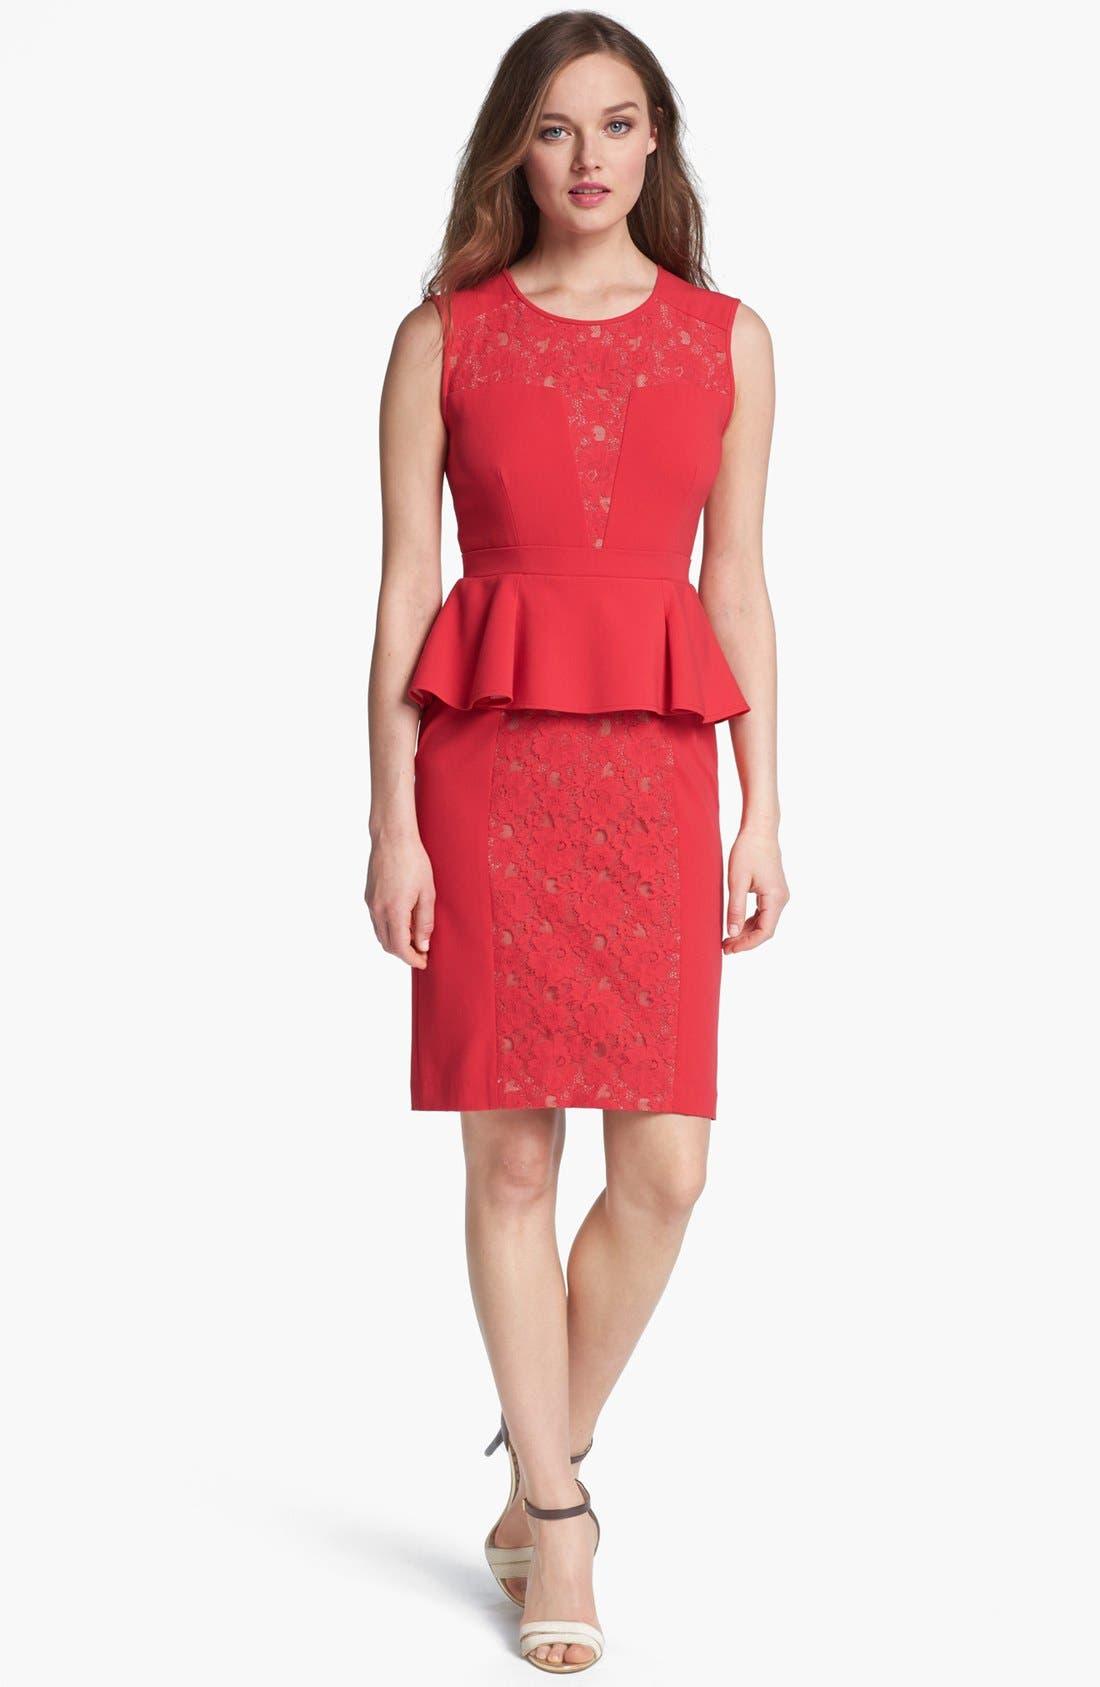 Alternate Image 1 Selected - BCBGMAXAZRIA Lace Inset Peplum Sheath Dress